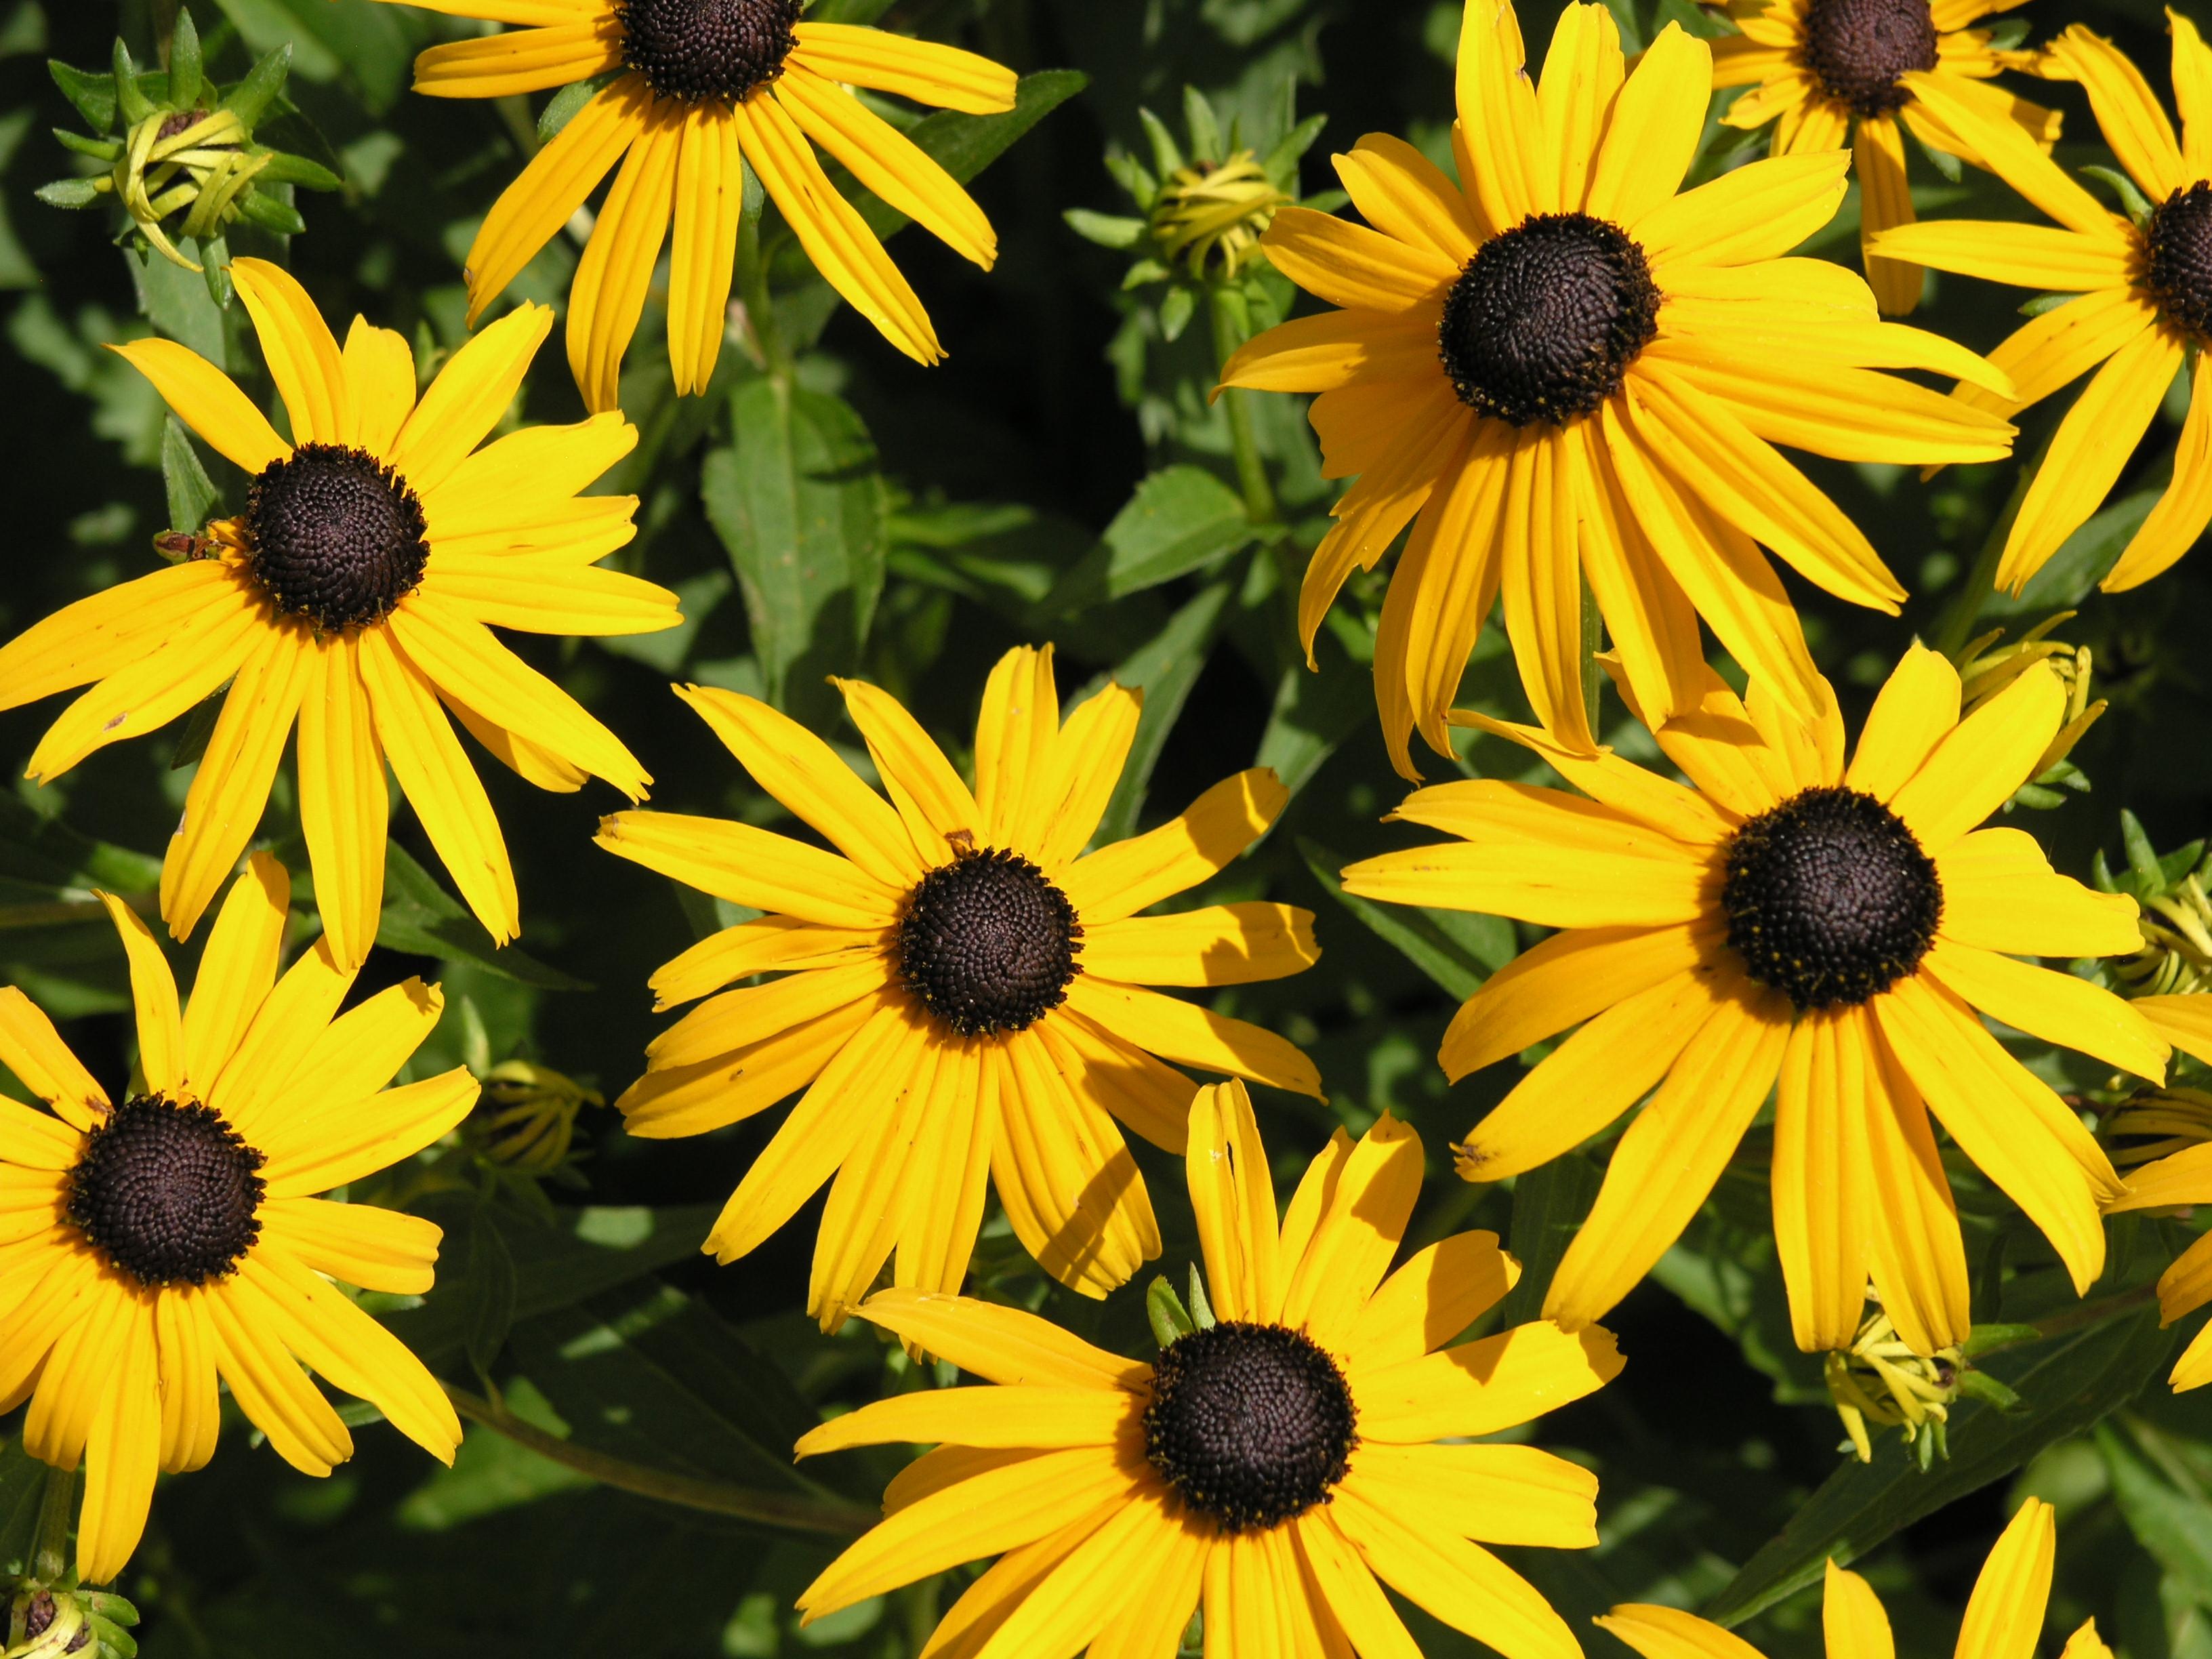 File 2006 07 25 rudbeckia fulgida2 jpg wikipedia - Plantas perennes exterior ...